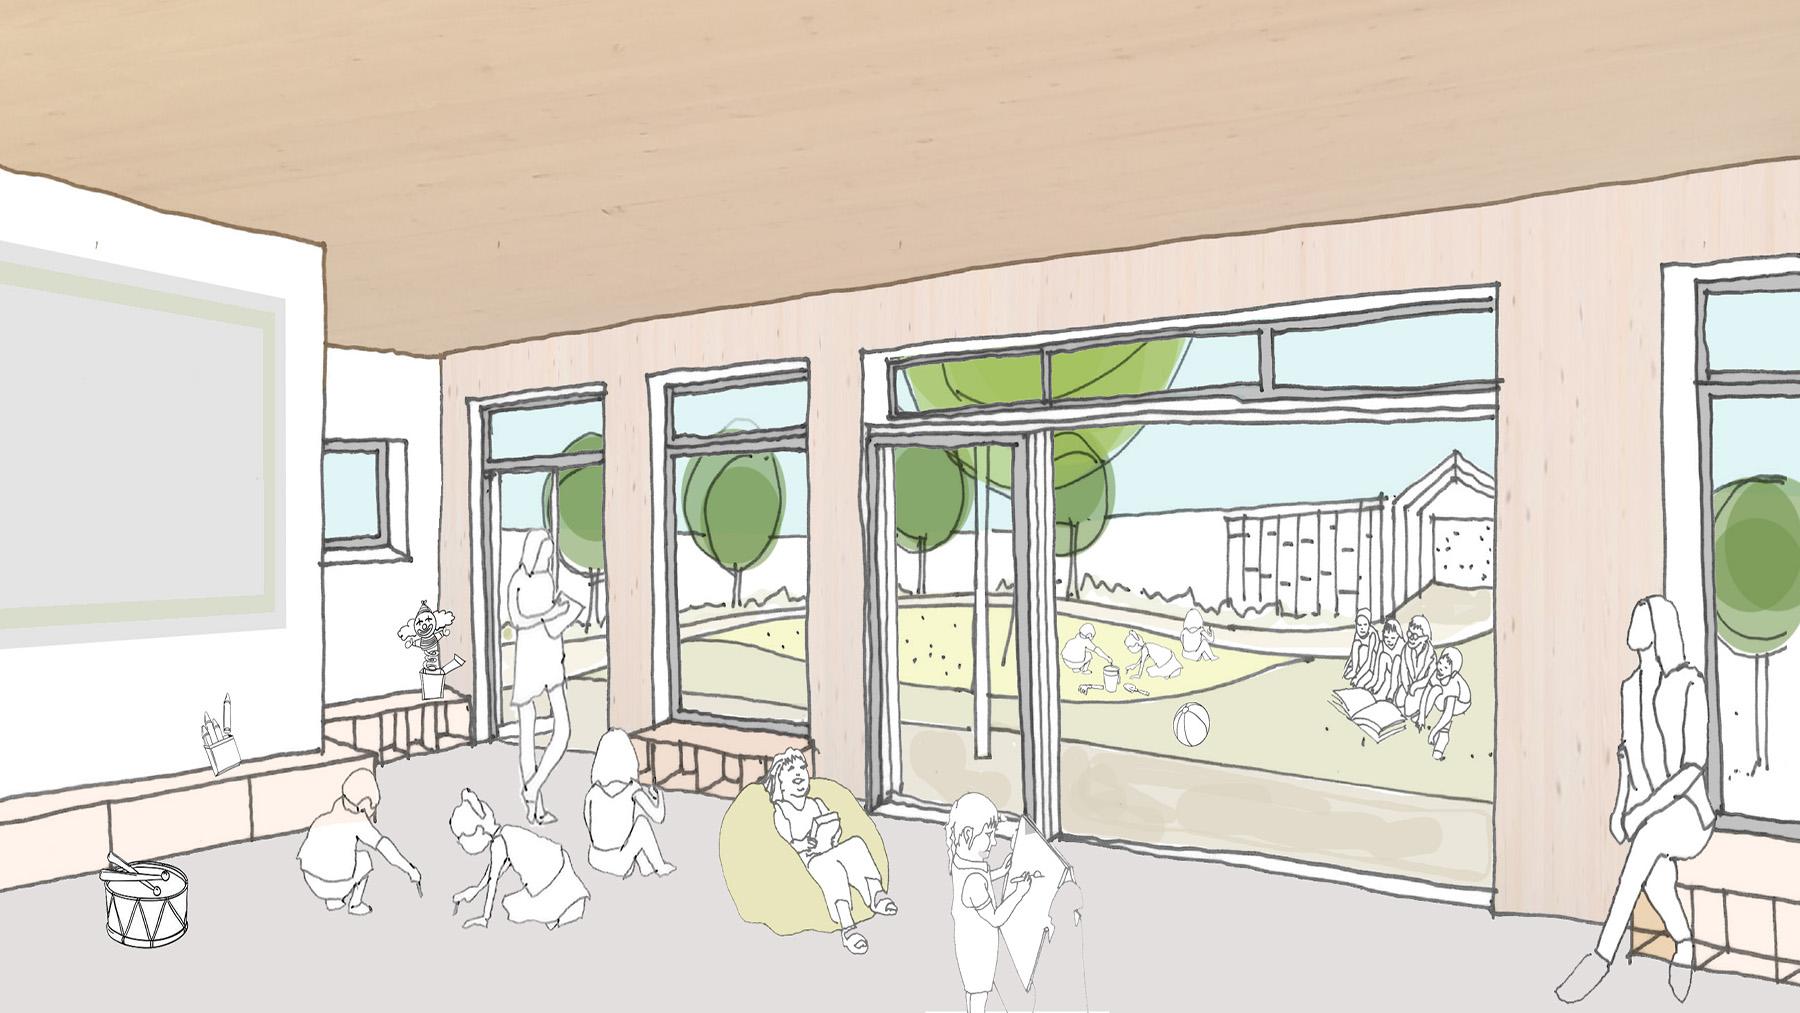 Sarah-Wigglesworth-Architects Portland-Nursery Internal-View-1 1800-slide